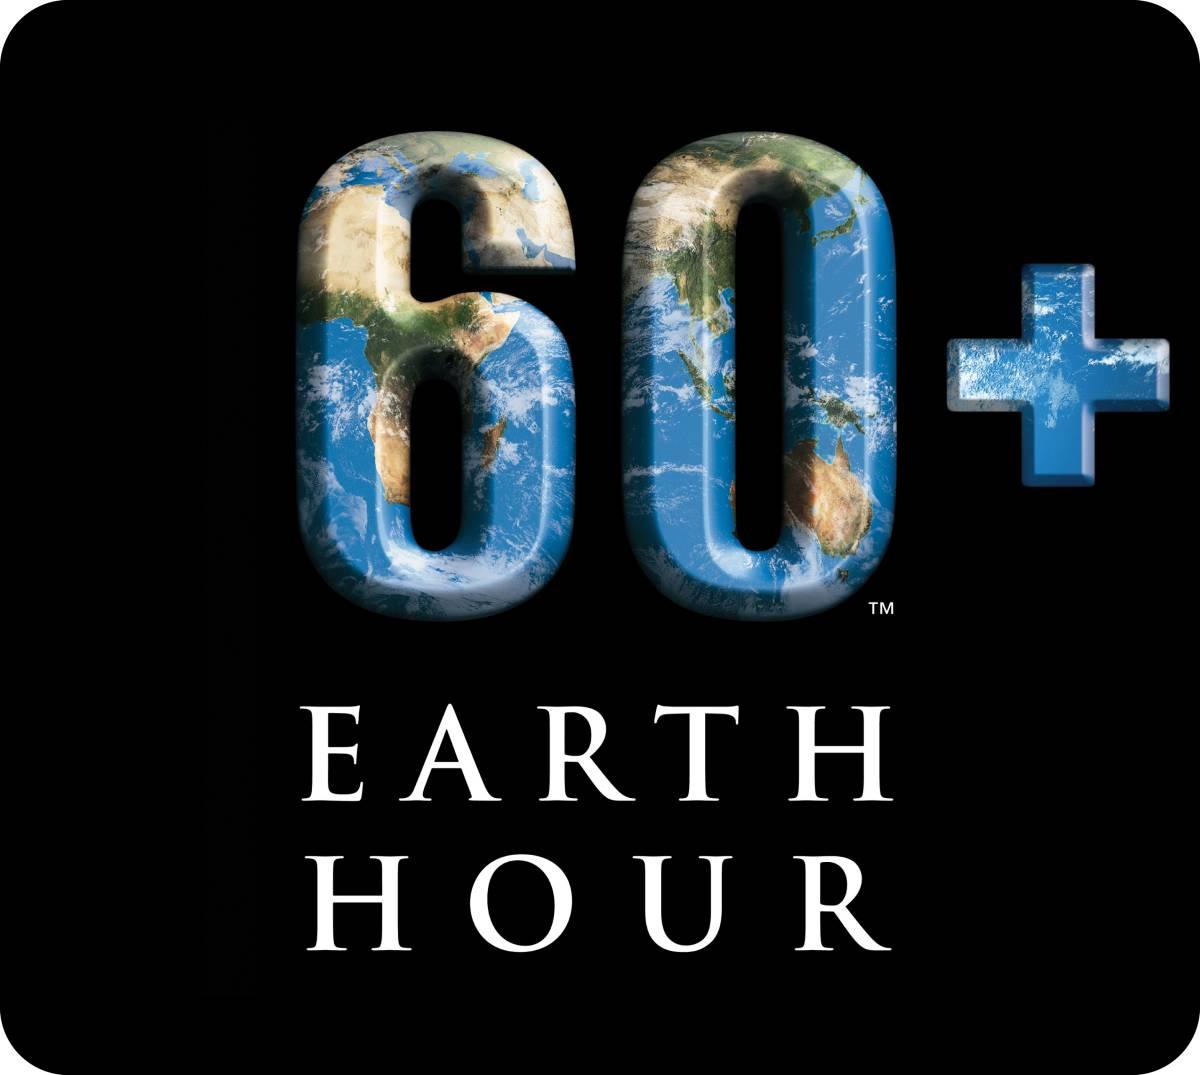 Royal Plaza on Scotts Turns Lights Off for Earth Hour